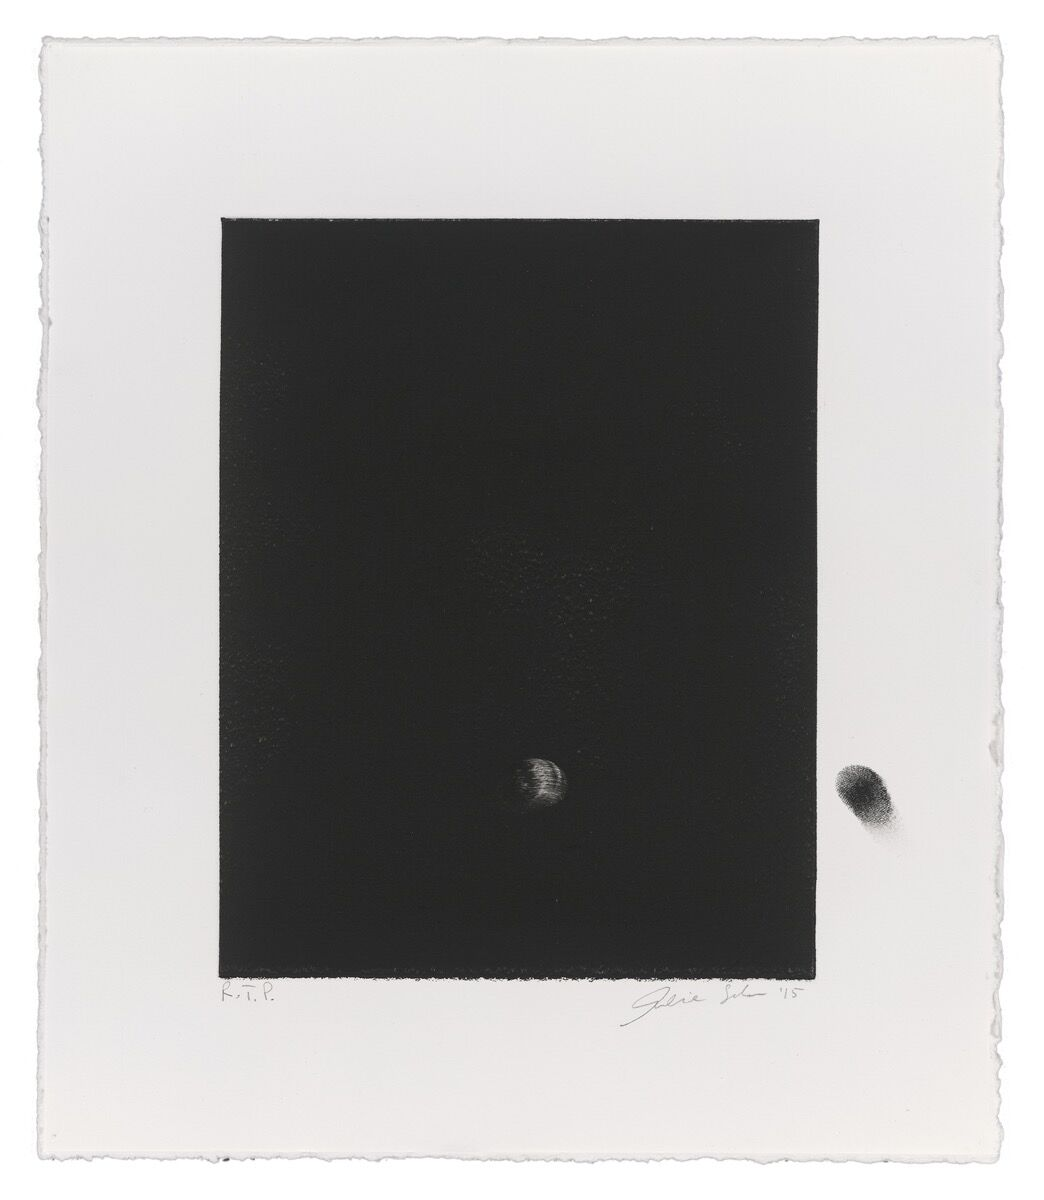 Analia Saban, Fingerprint, 2016. Courtesy of Gemini G.E.L. at Joni Moisant Weyl.